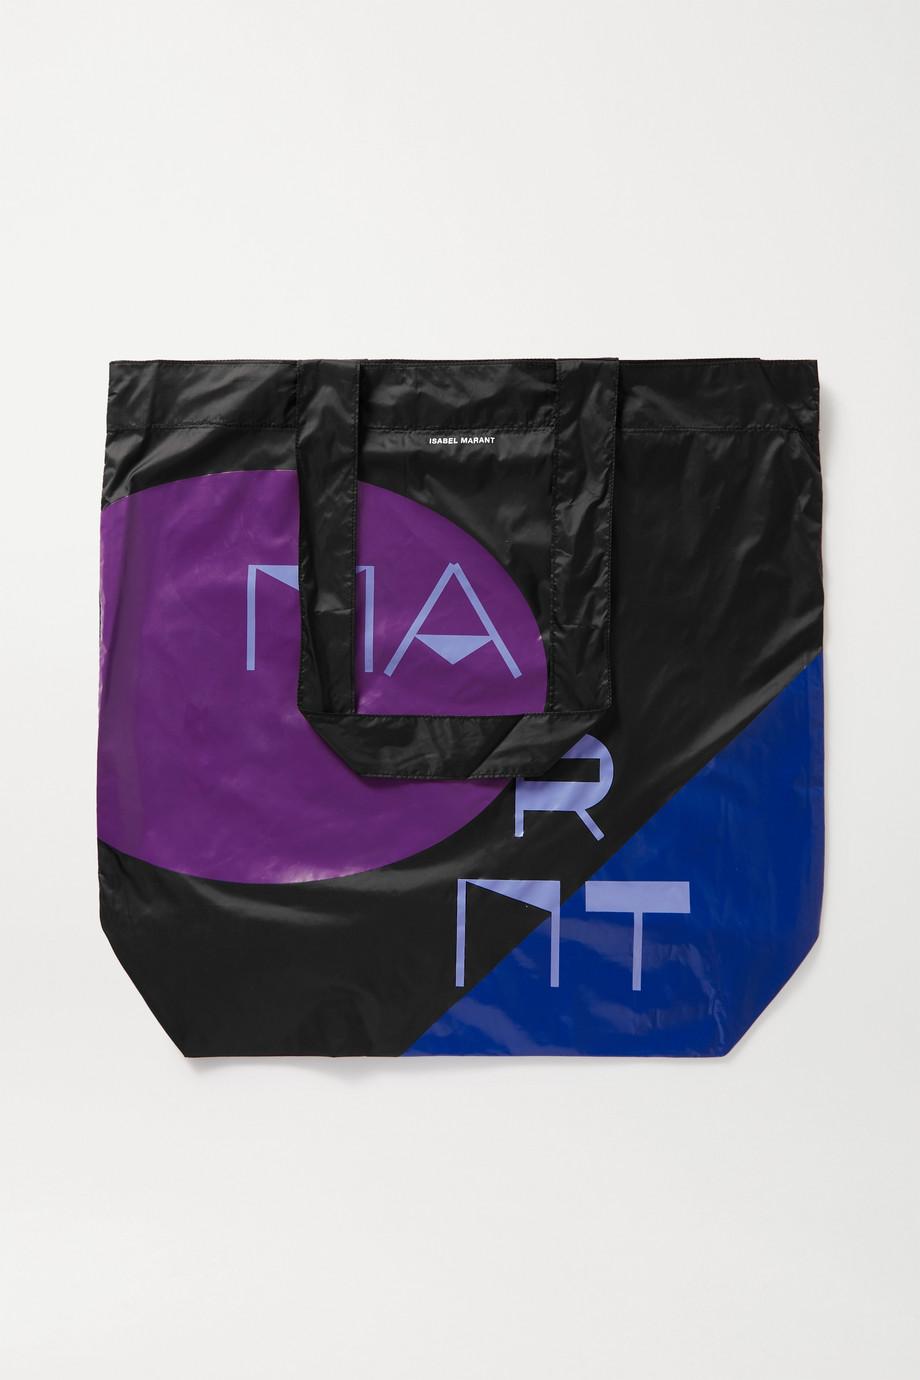 Isabel Marant Woom printed nylon tote